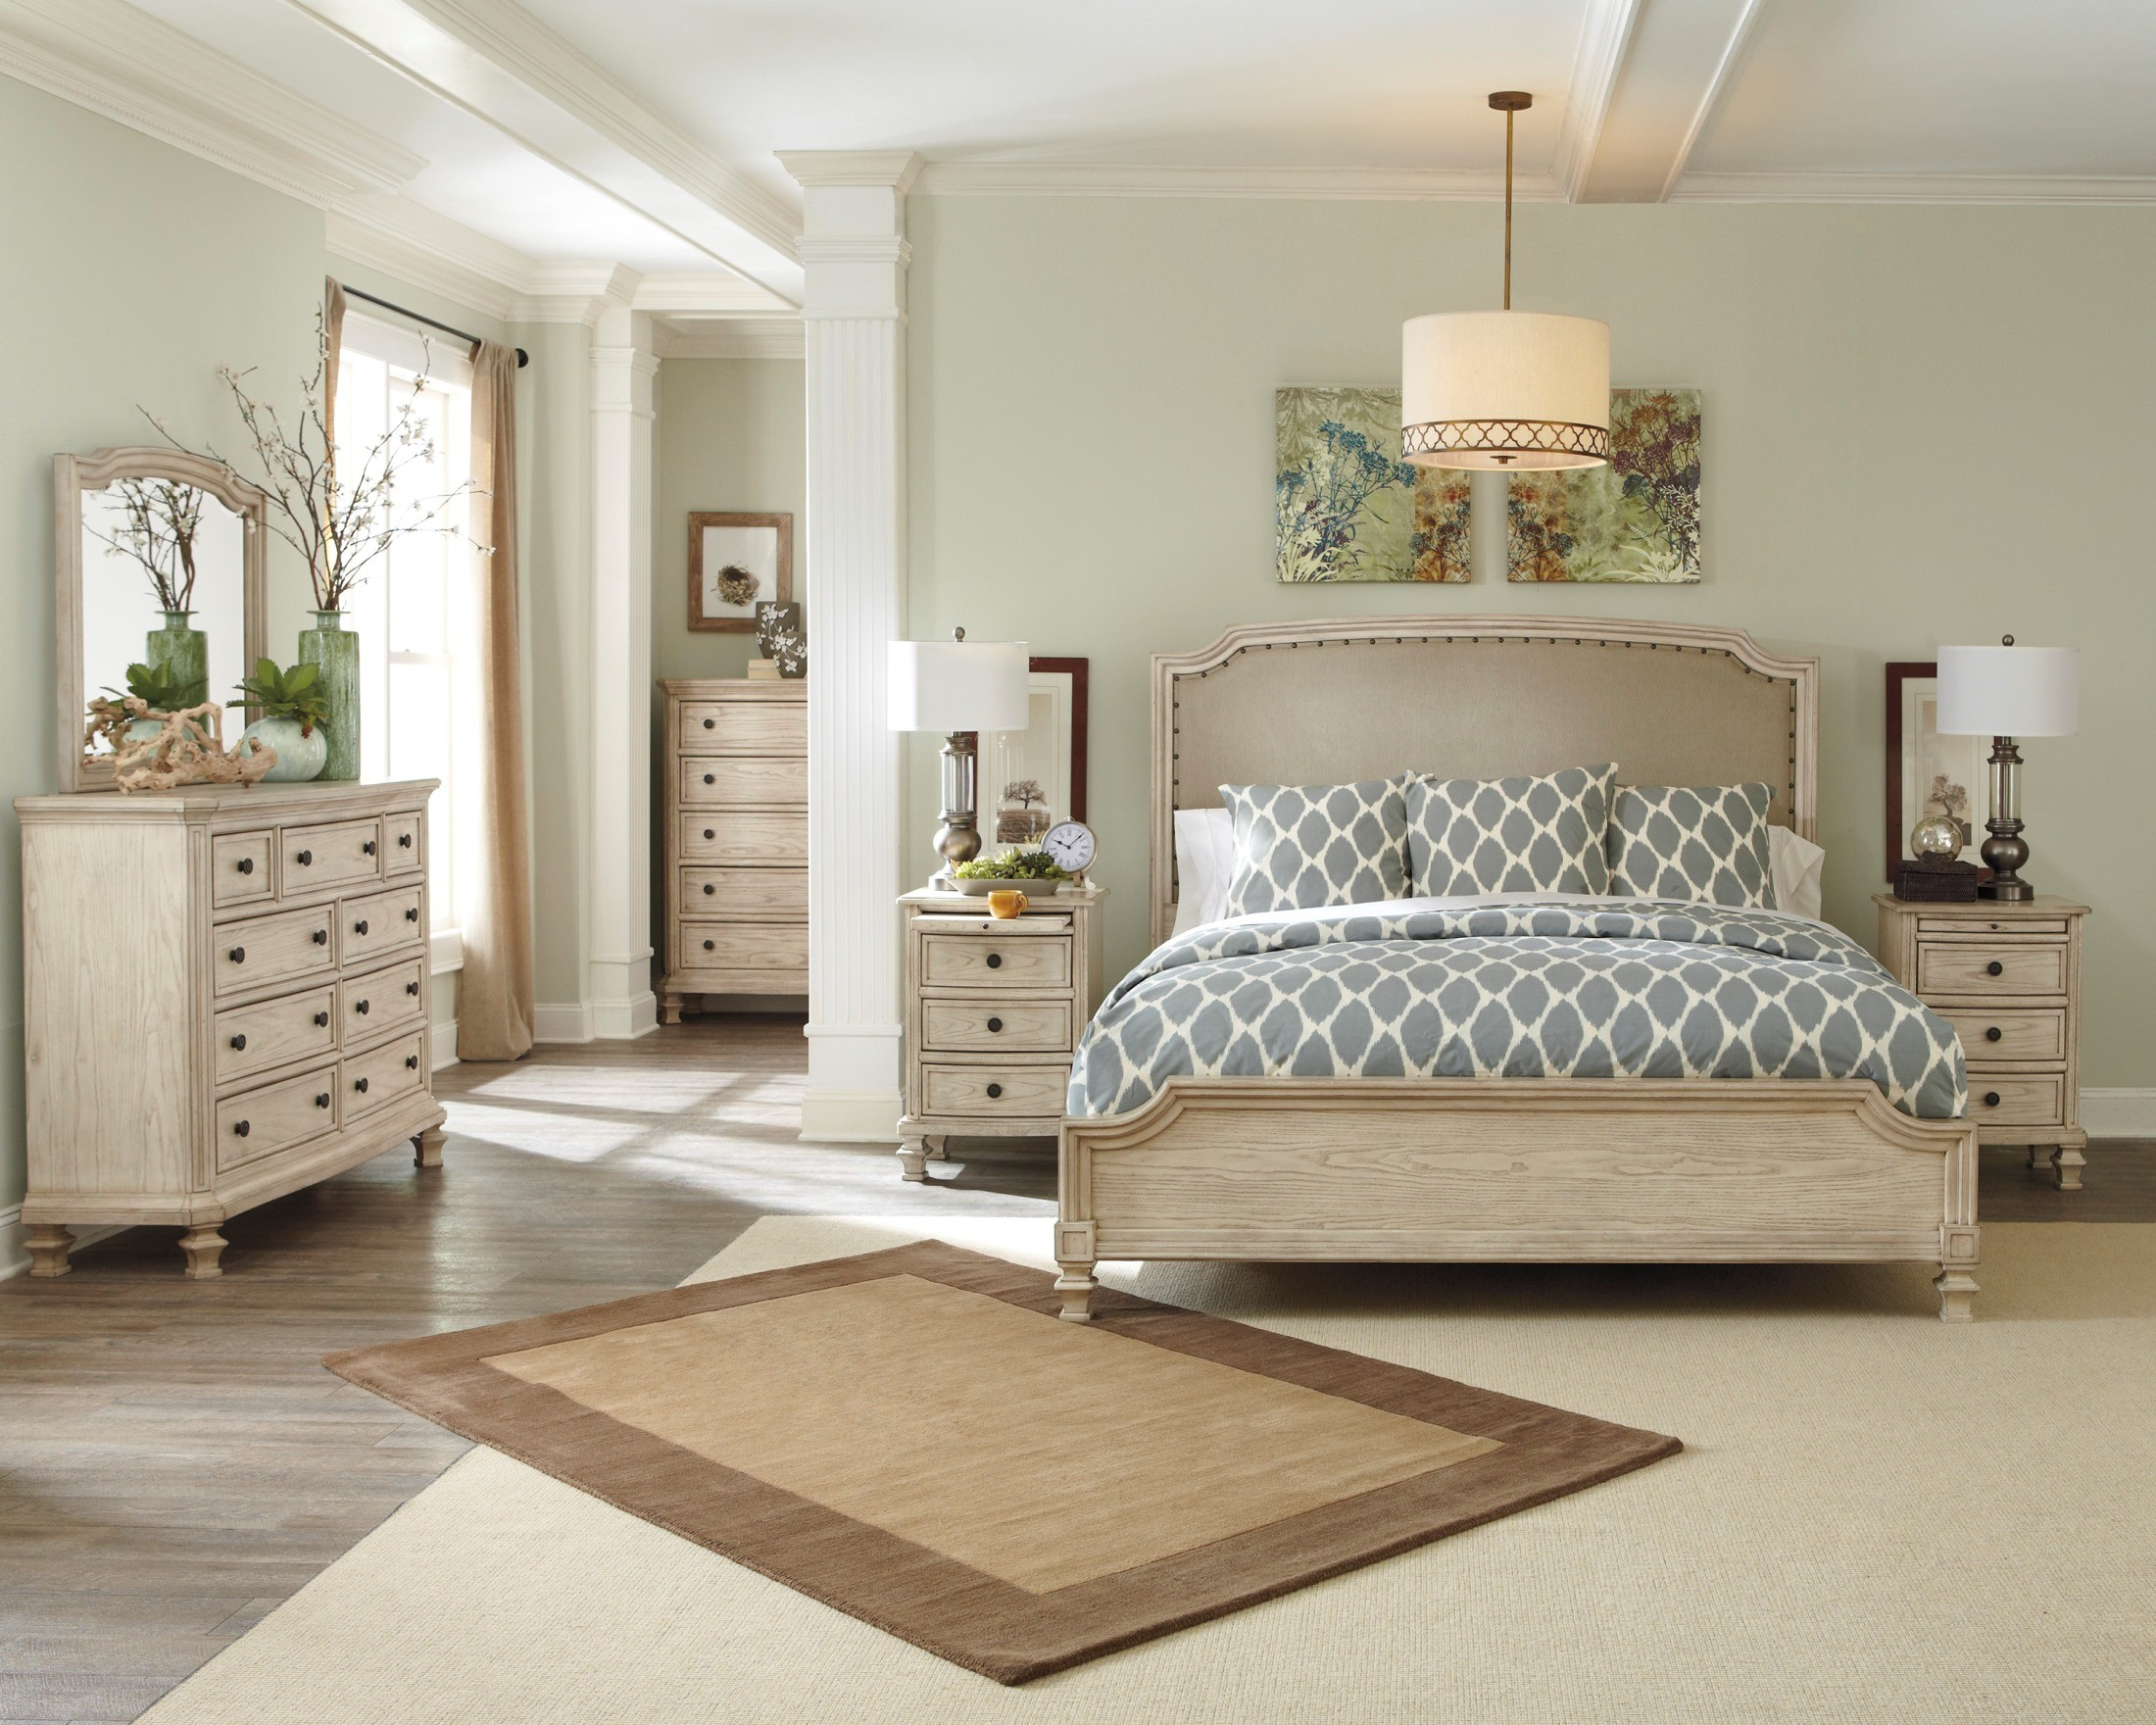 Demarlos Dresser From Ashley B693 31 Coleman Furniture